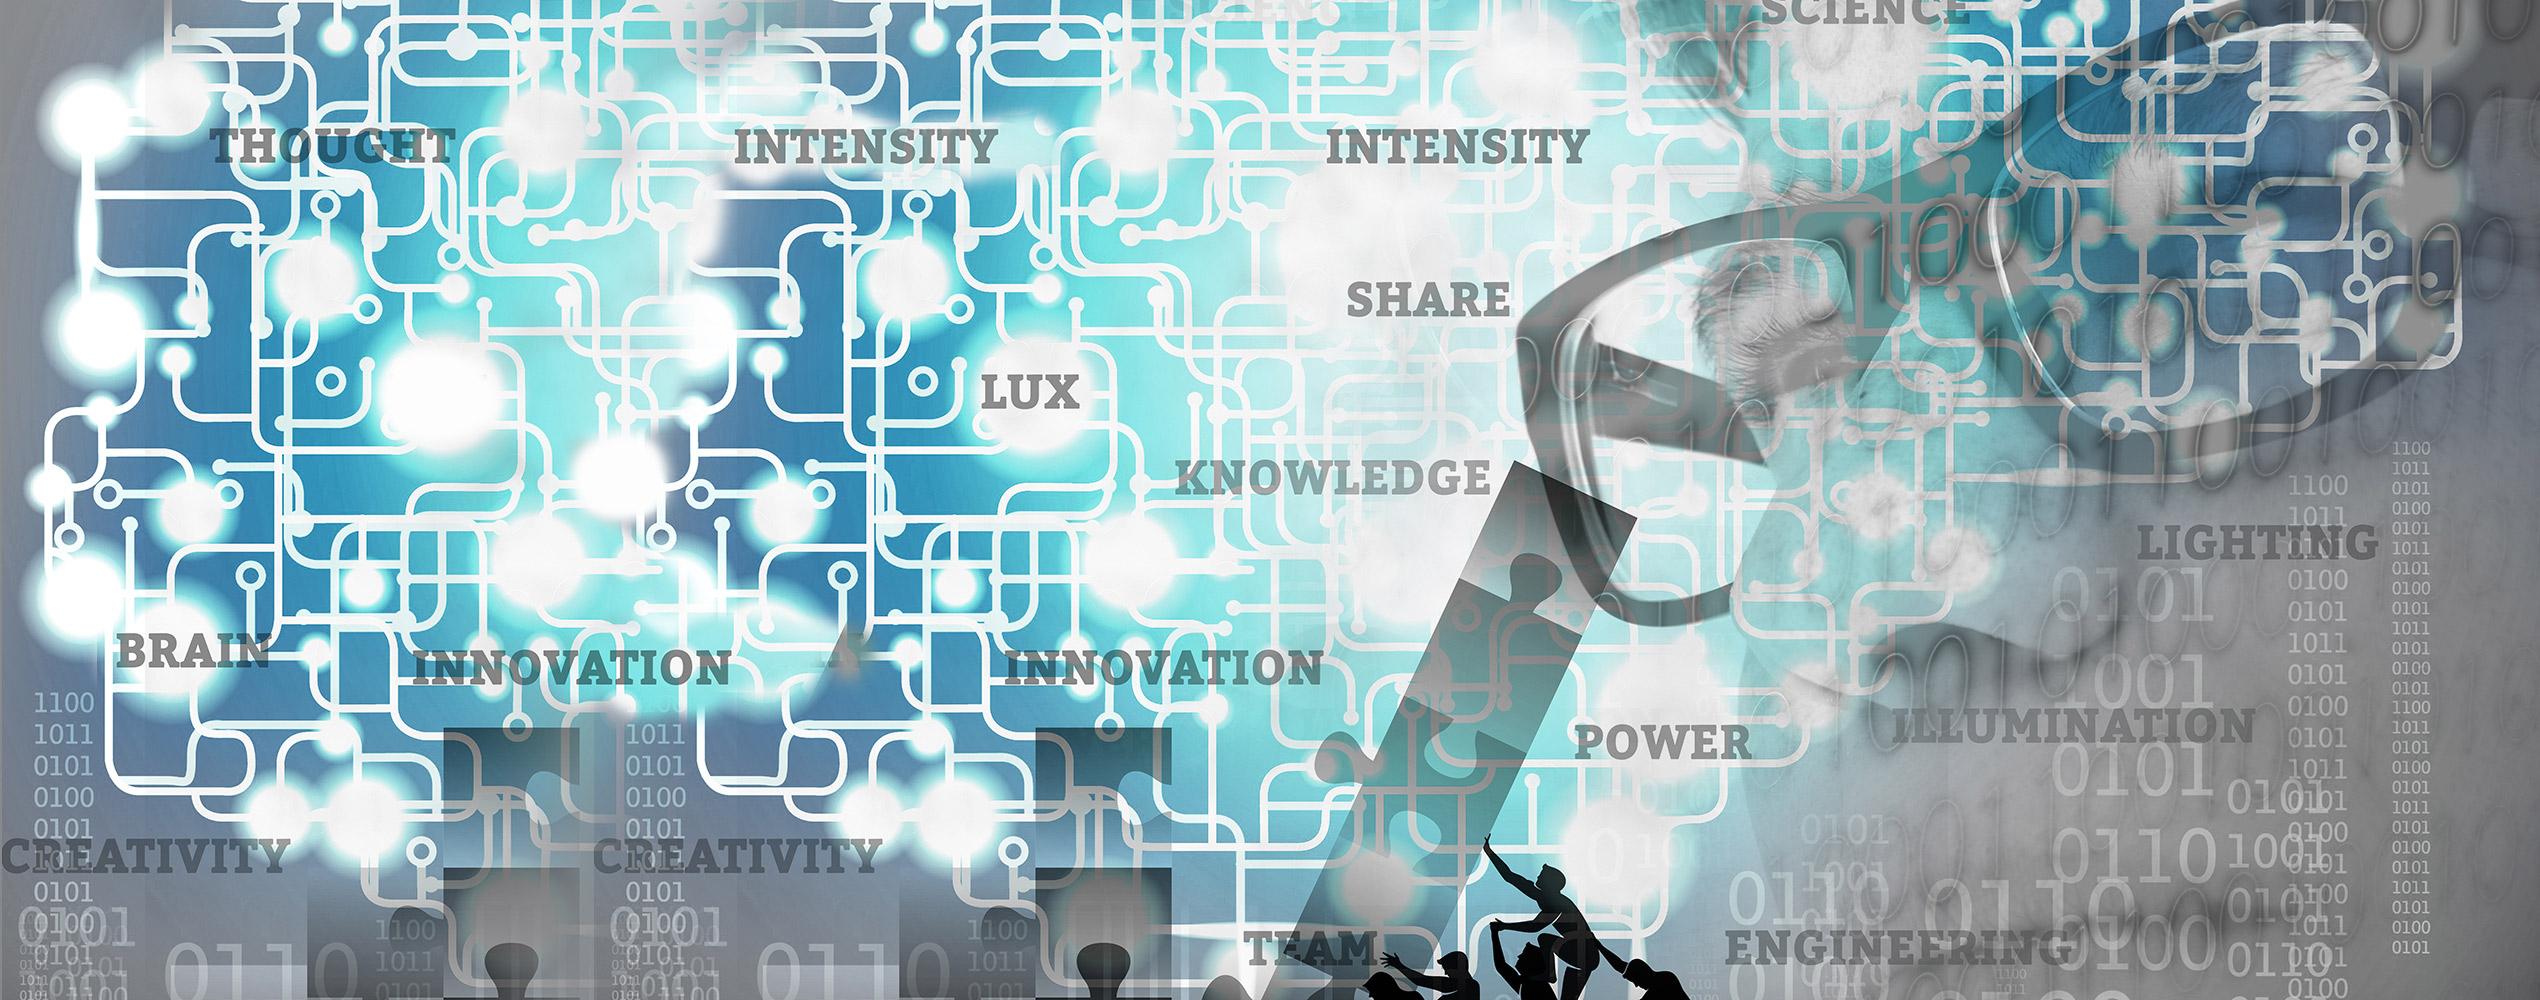 HEADER-2-pixabay-Ravindra-Panwar-automation-2710335-2540x1000